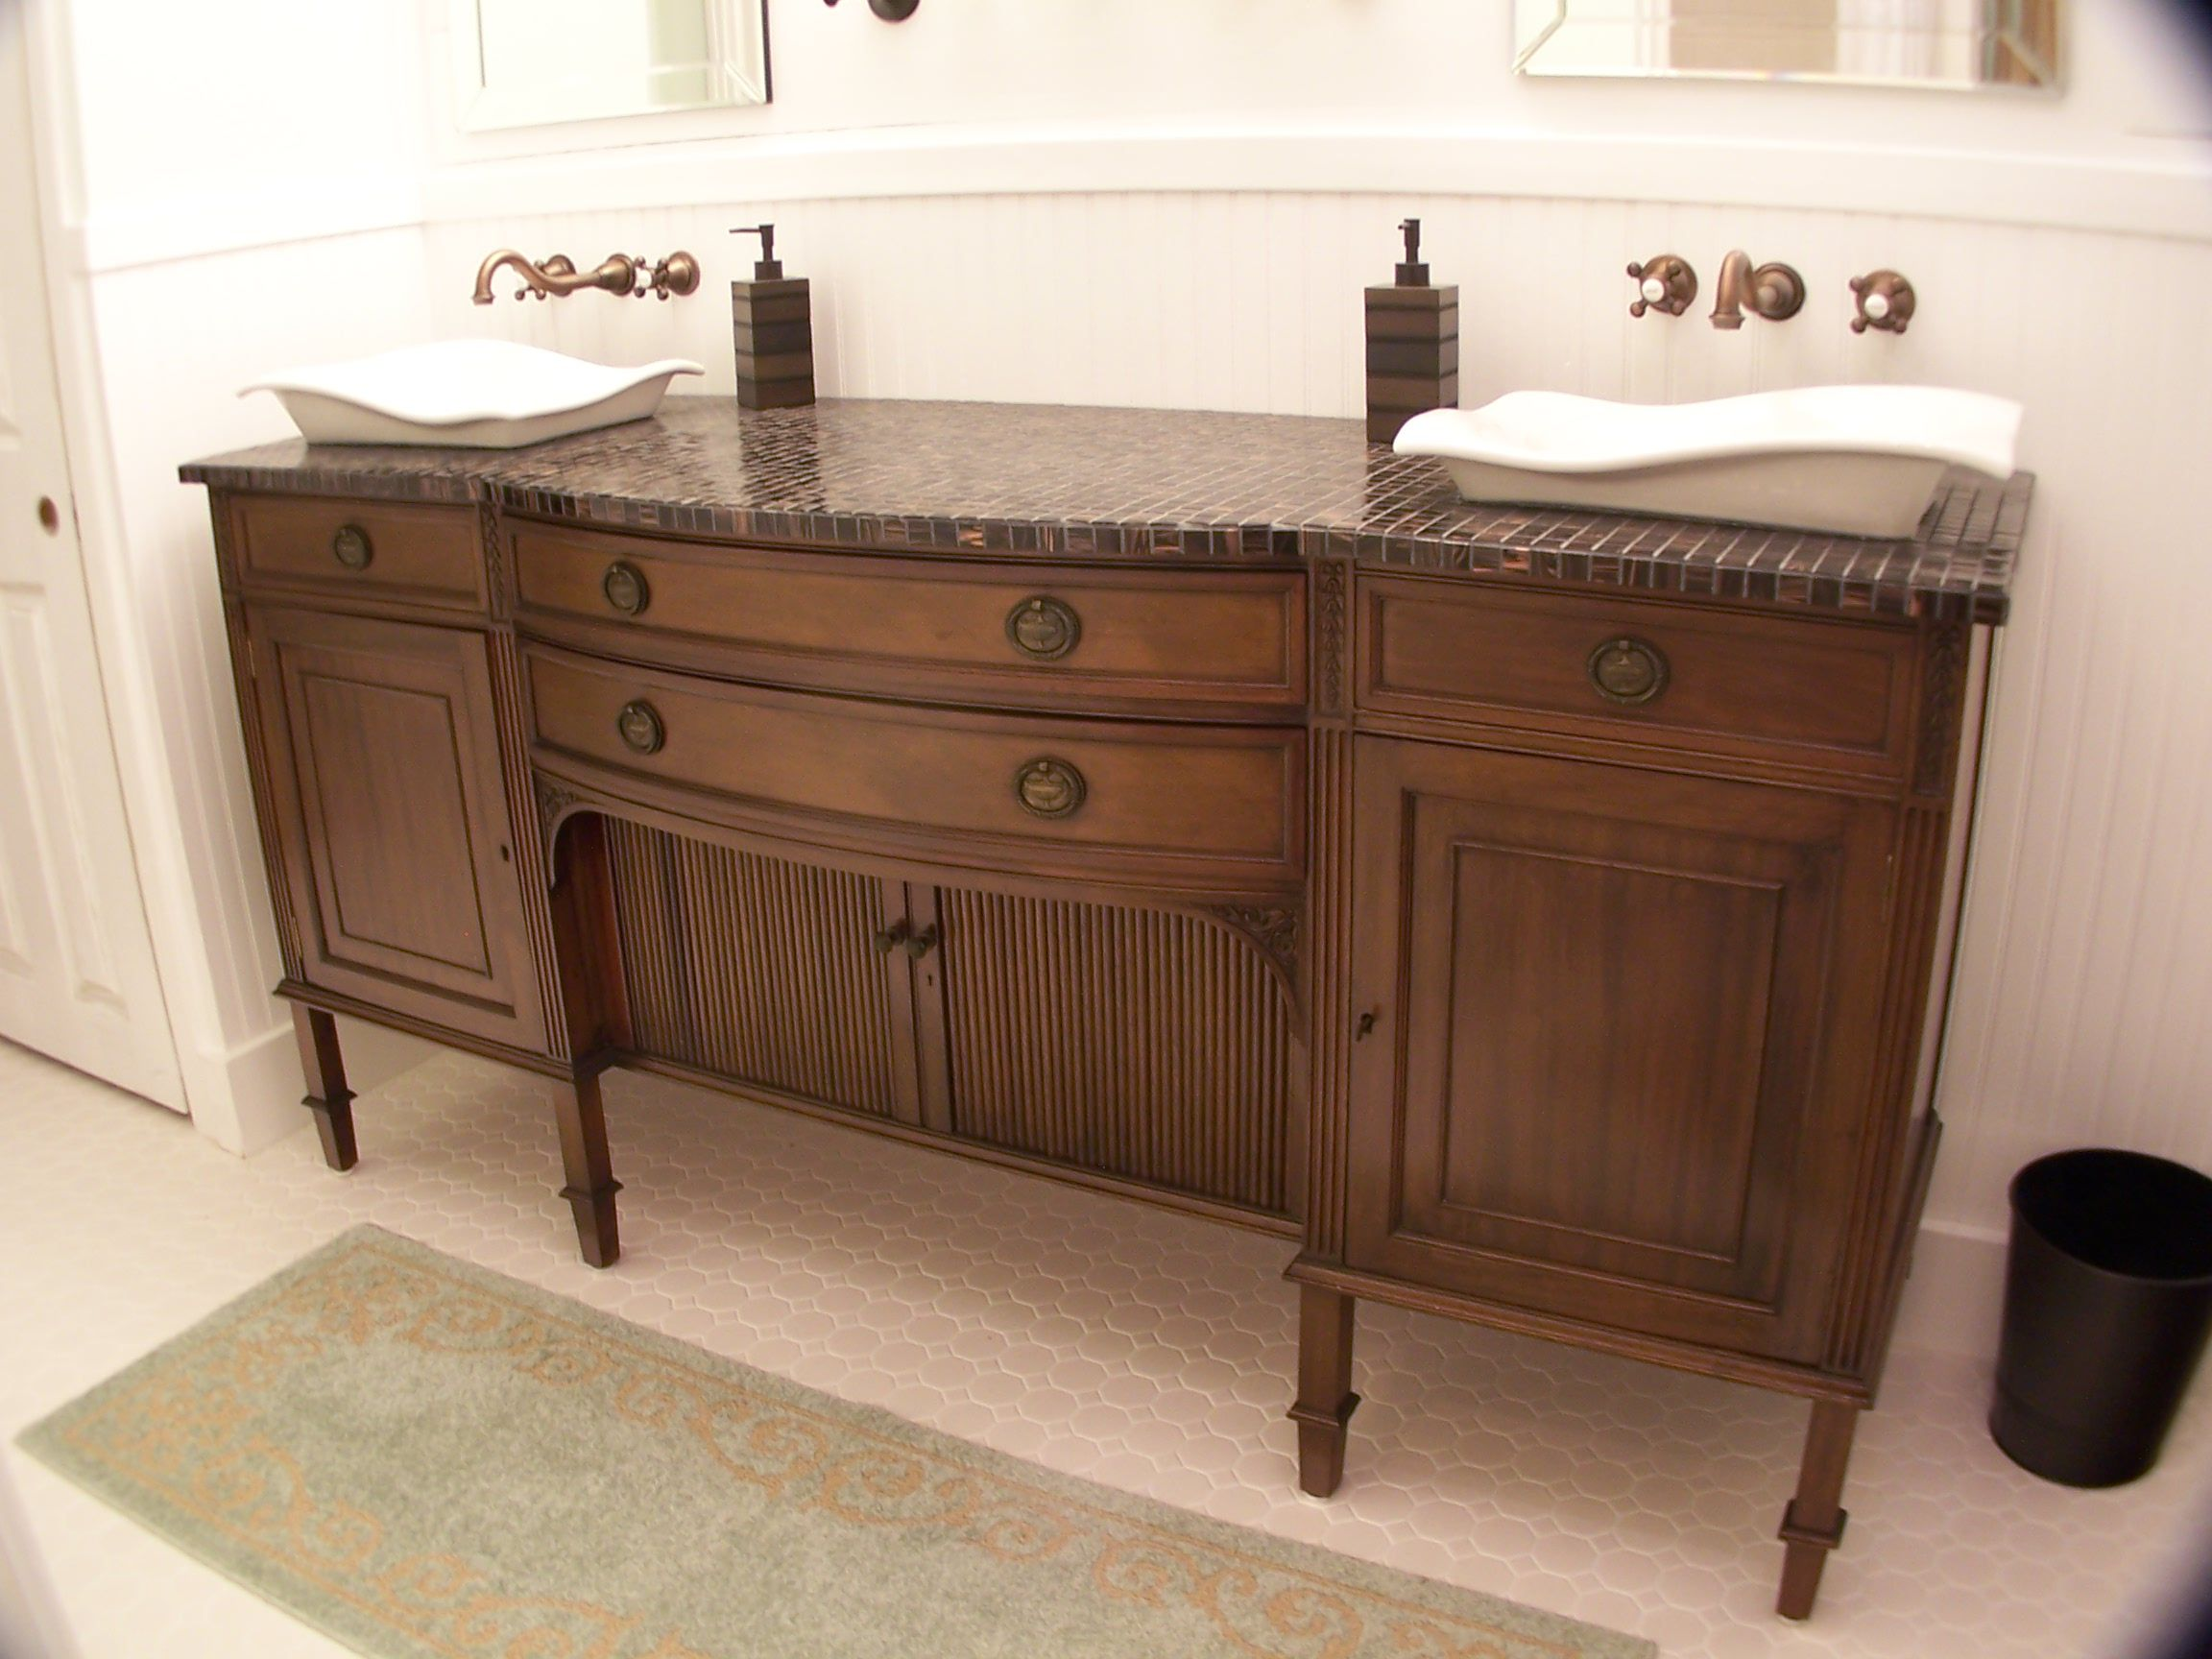 Buffet Turned Vanity Furniture Make Overs Pinterest Buffet Vanities And Bathroom Vanities